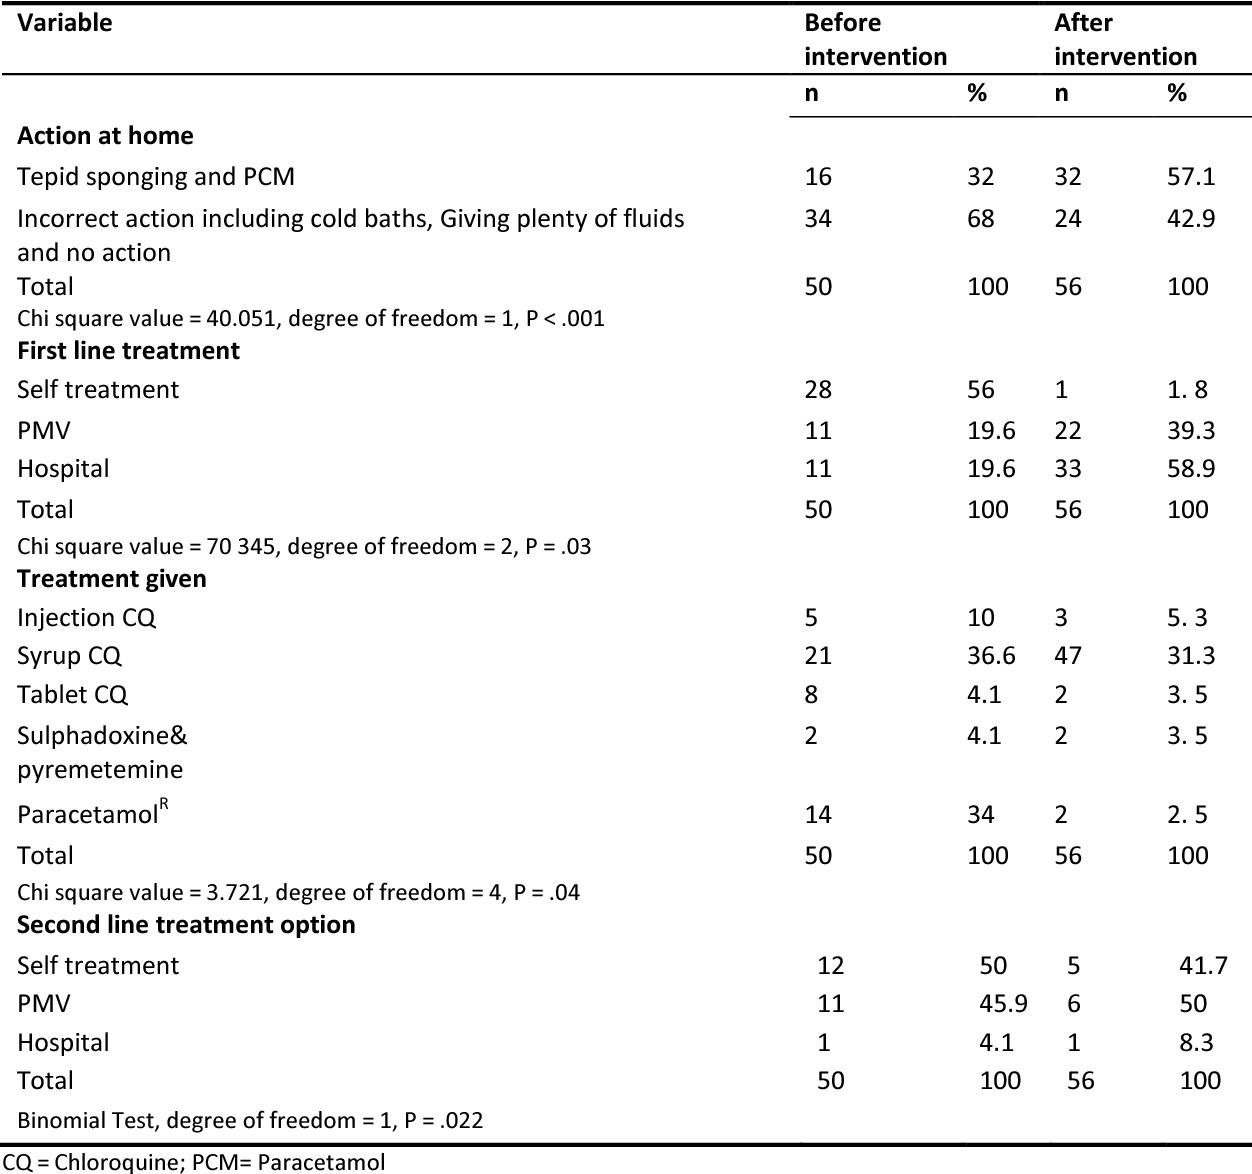 Table 3. Impact of health education on malaria treatment